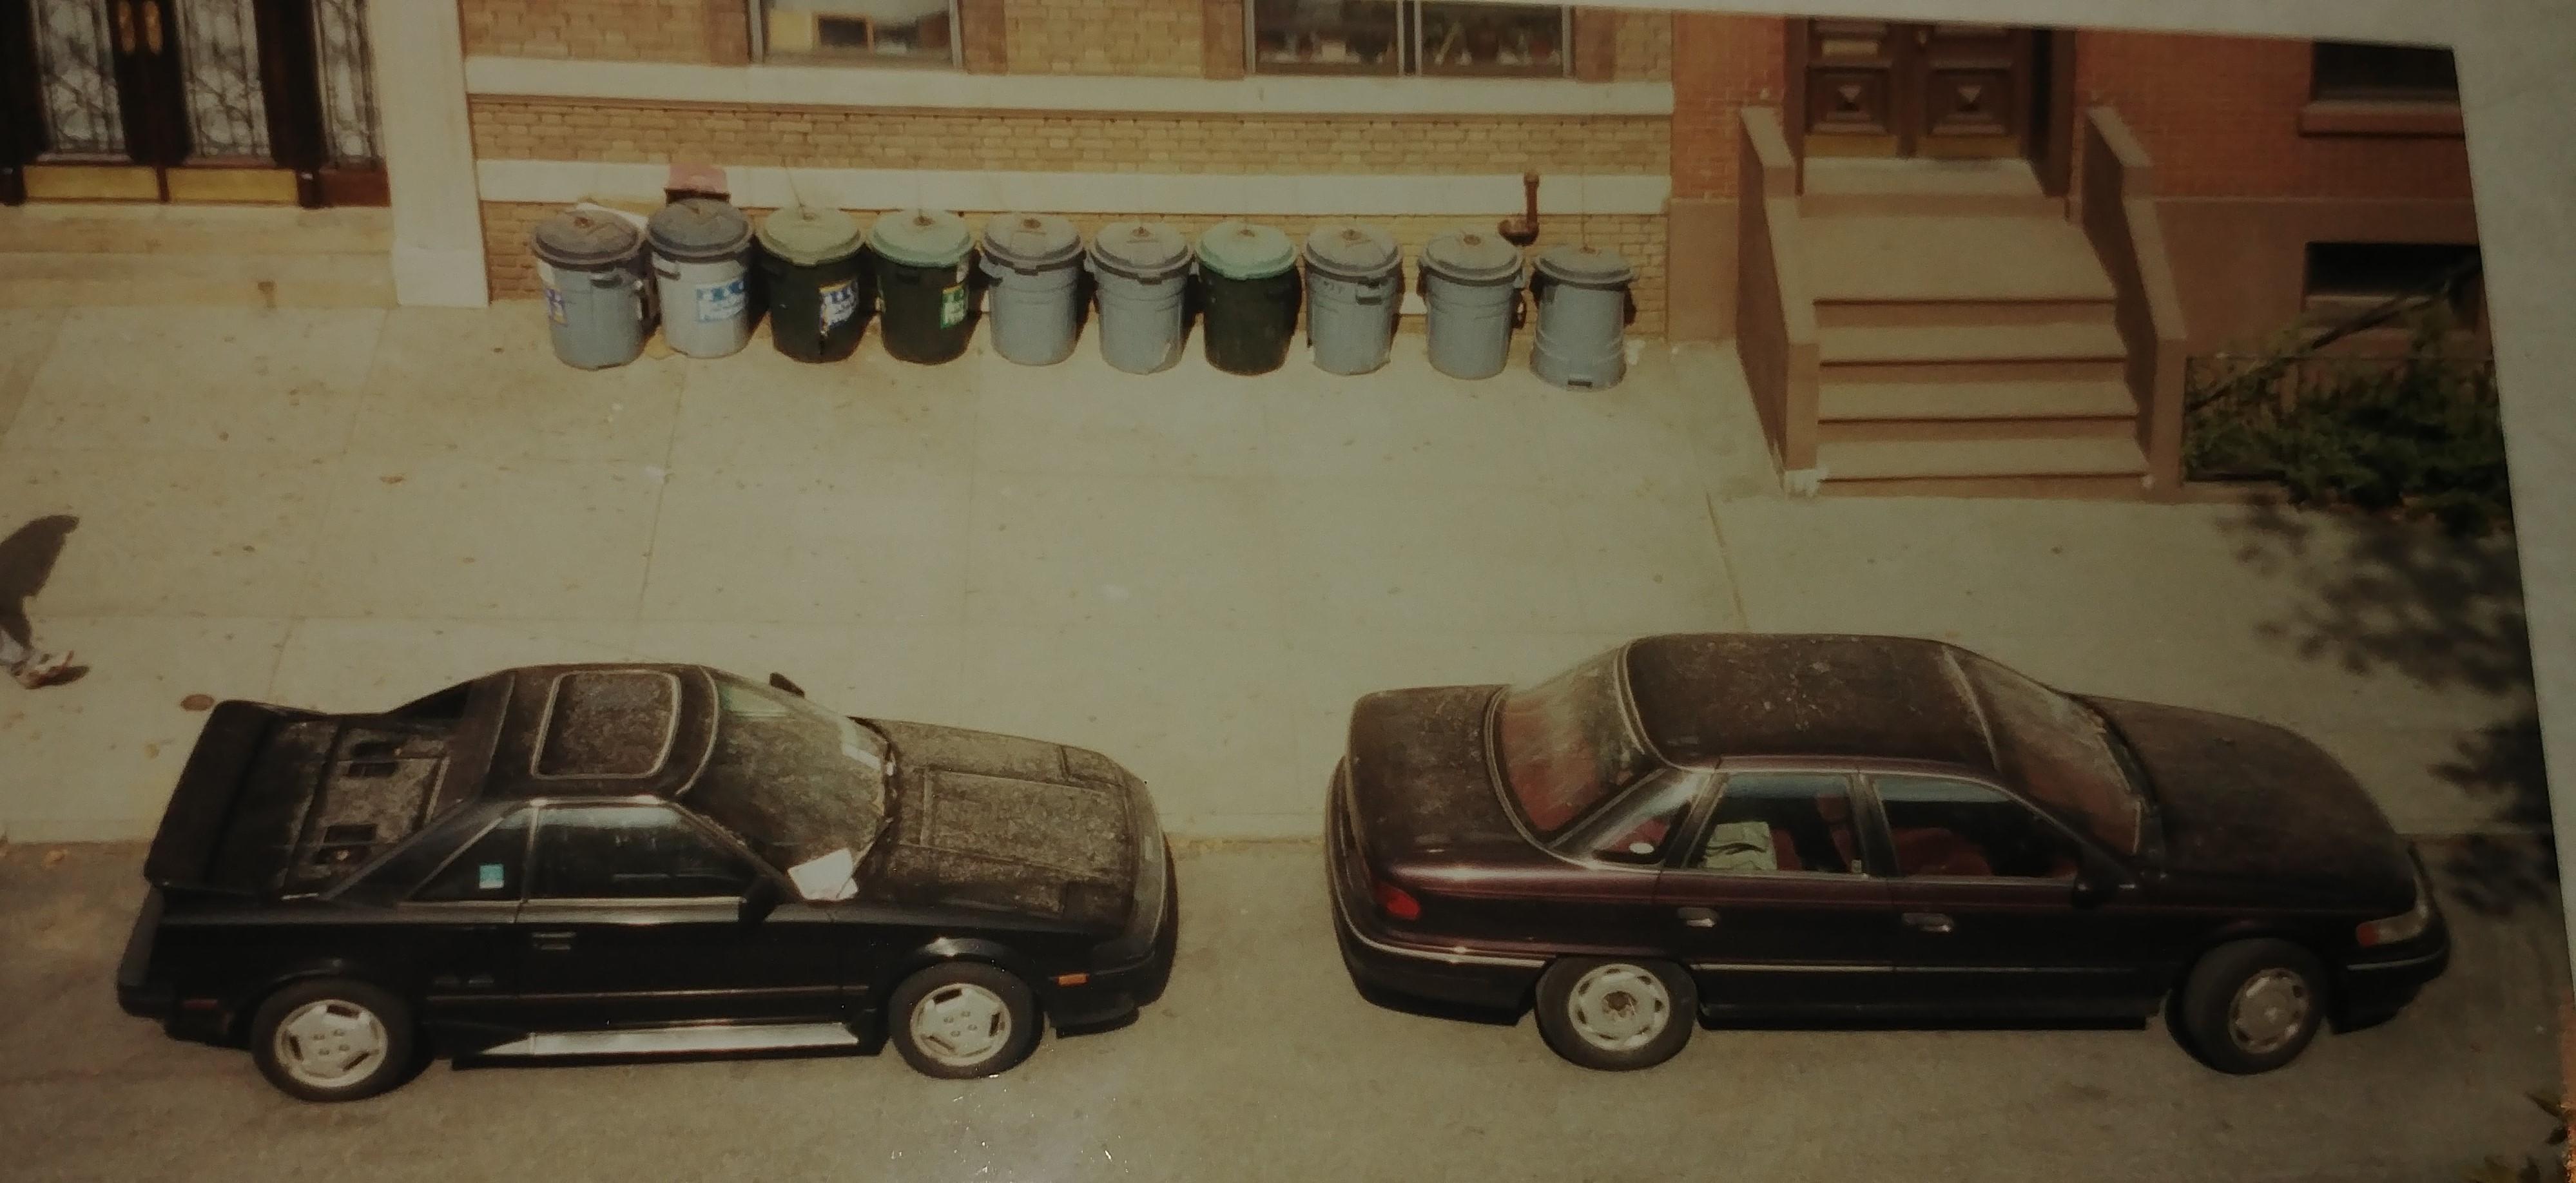 cars in drew's neighborhood